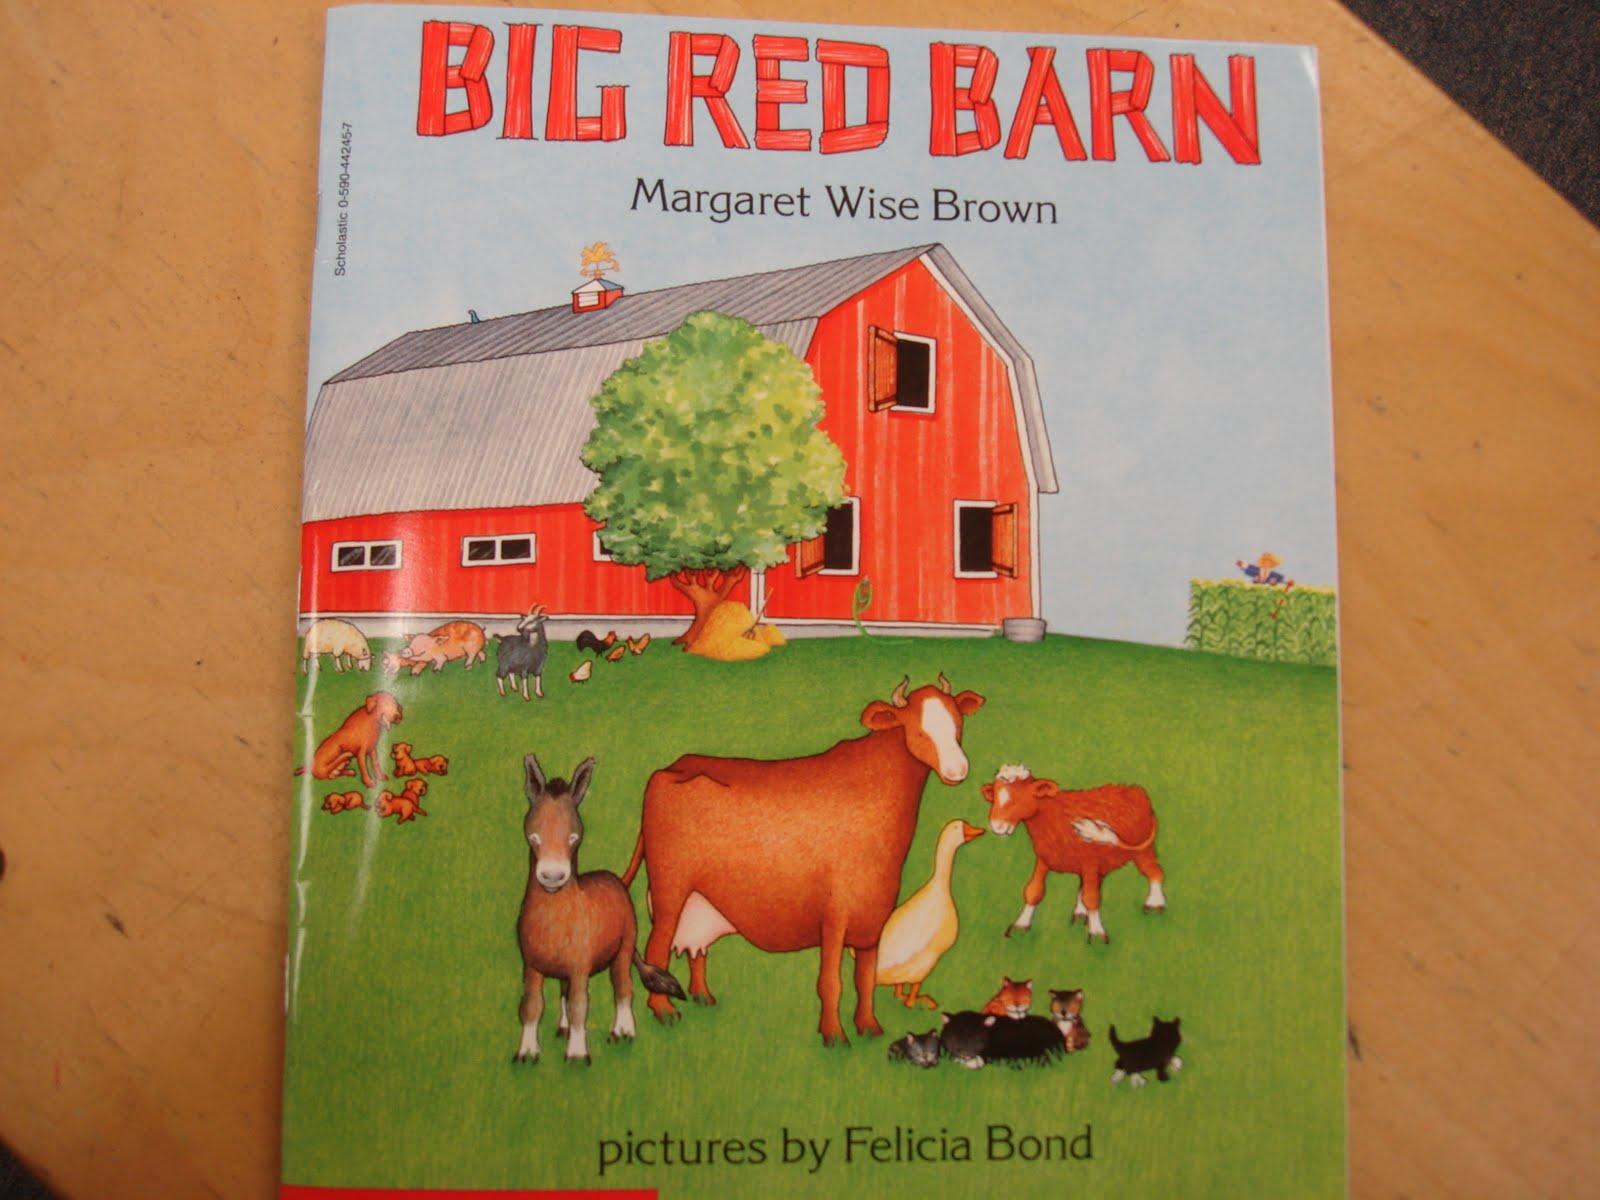 Big Red Barn Margaret Wise Brown Coloring Pages - Worksheet ...